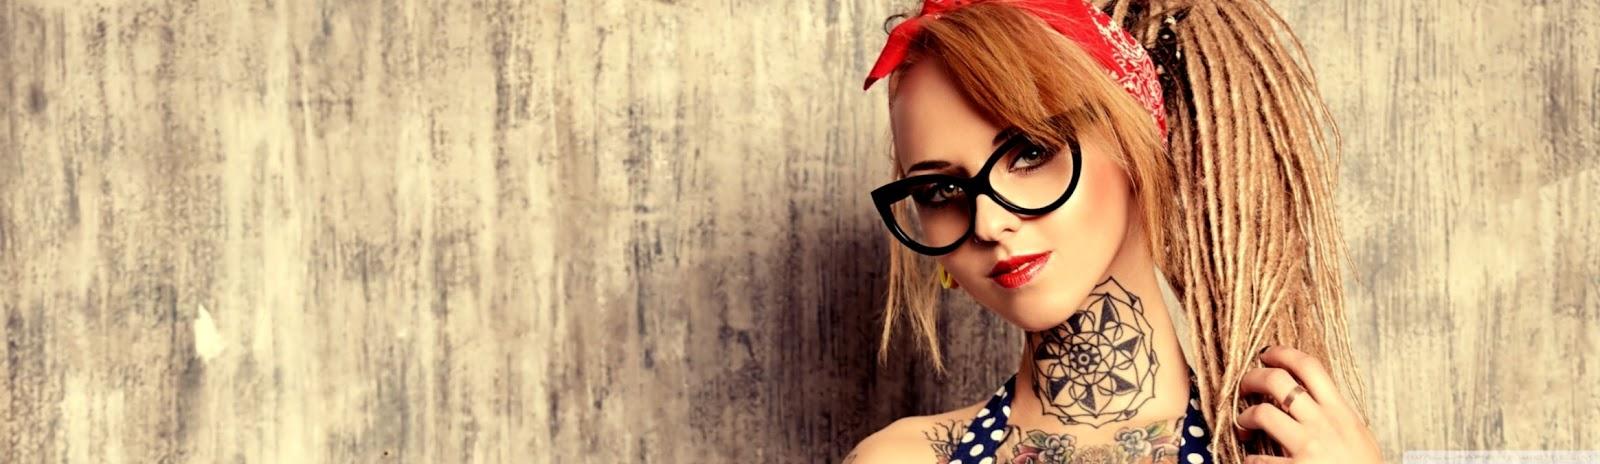 Tattoo Girls Wallpaper For Desktop Wallpapers Pc